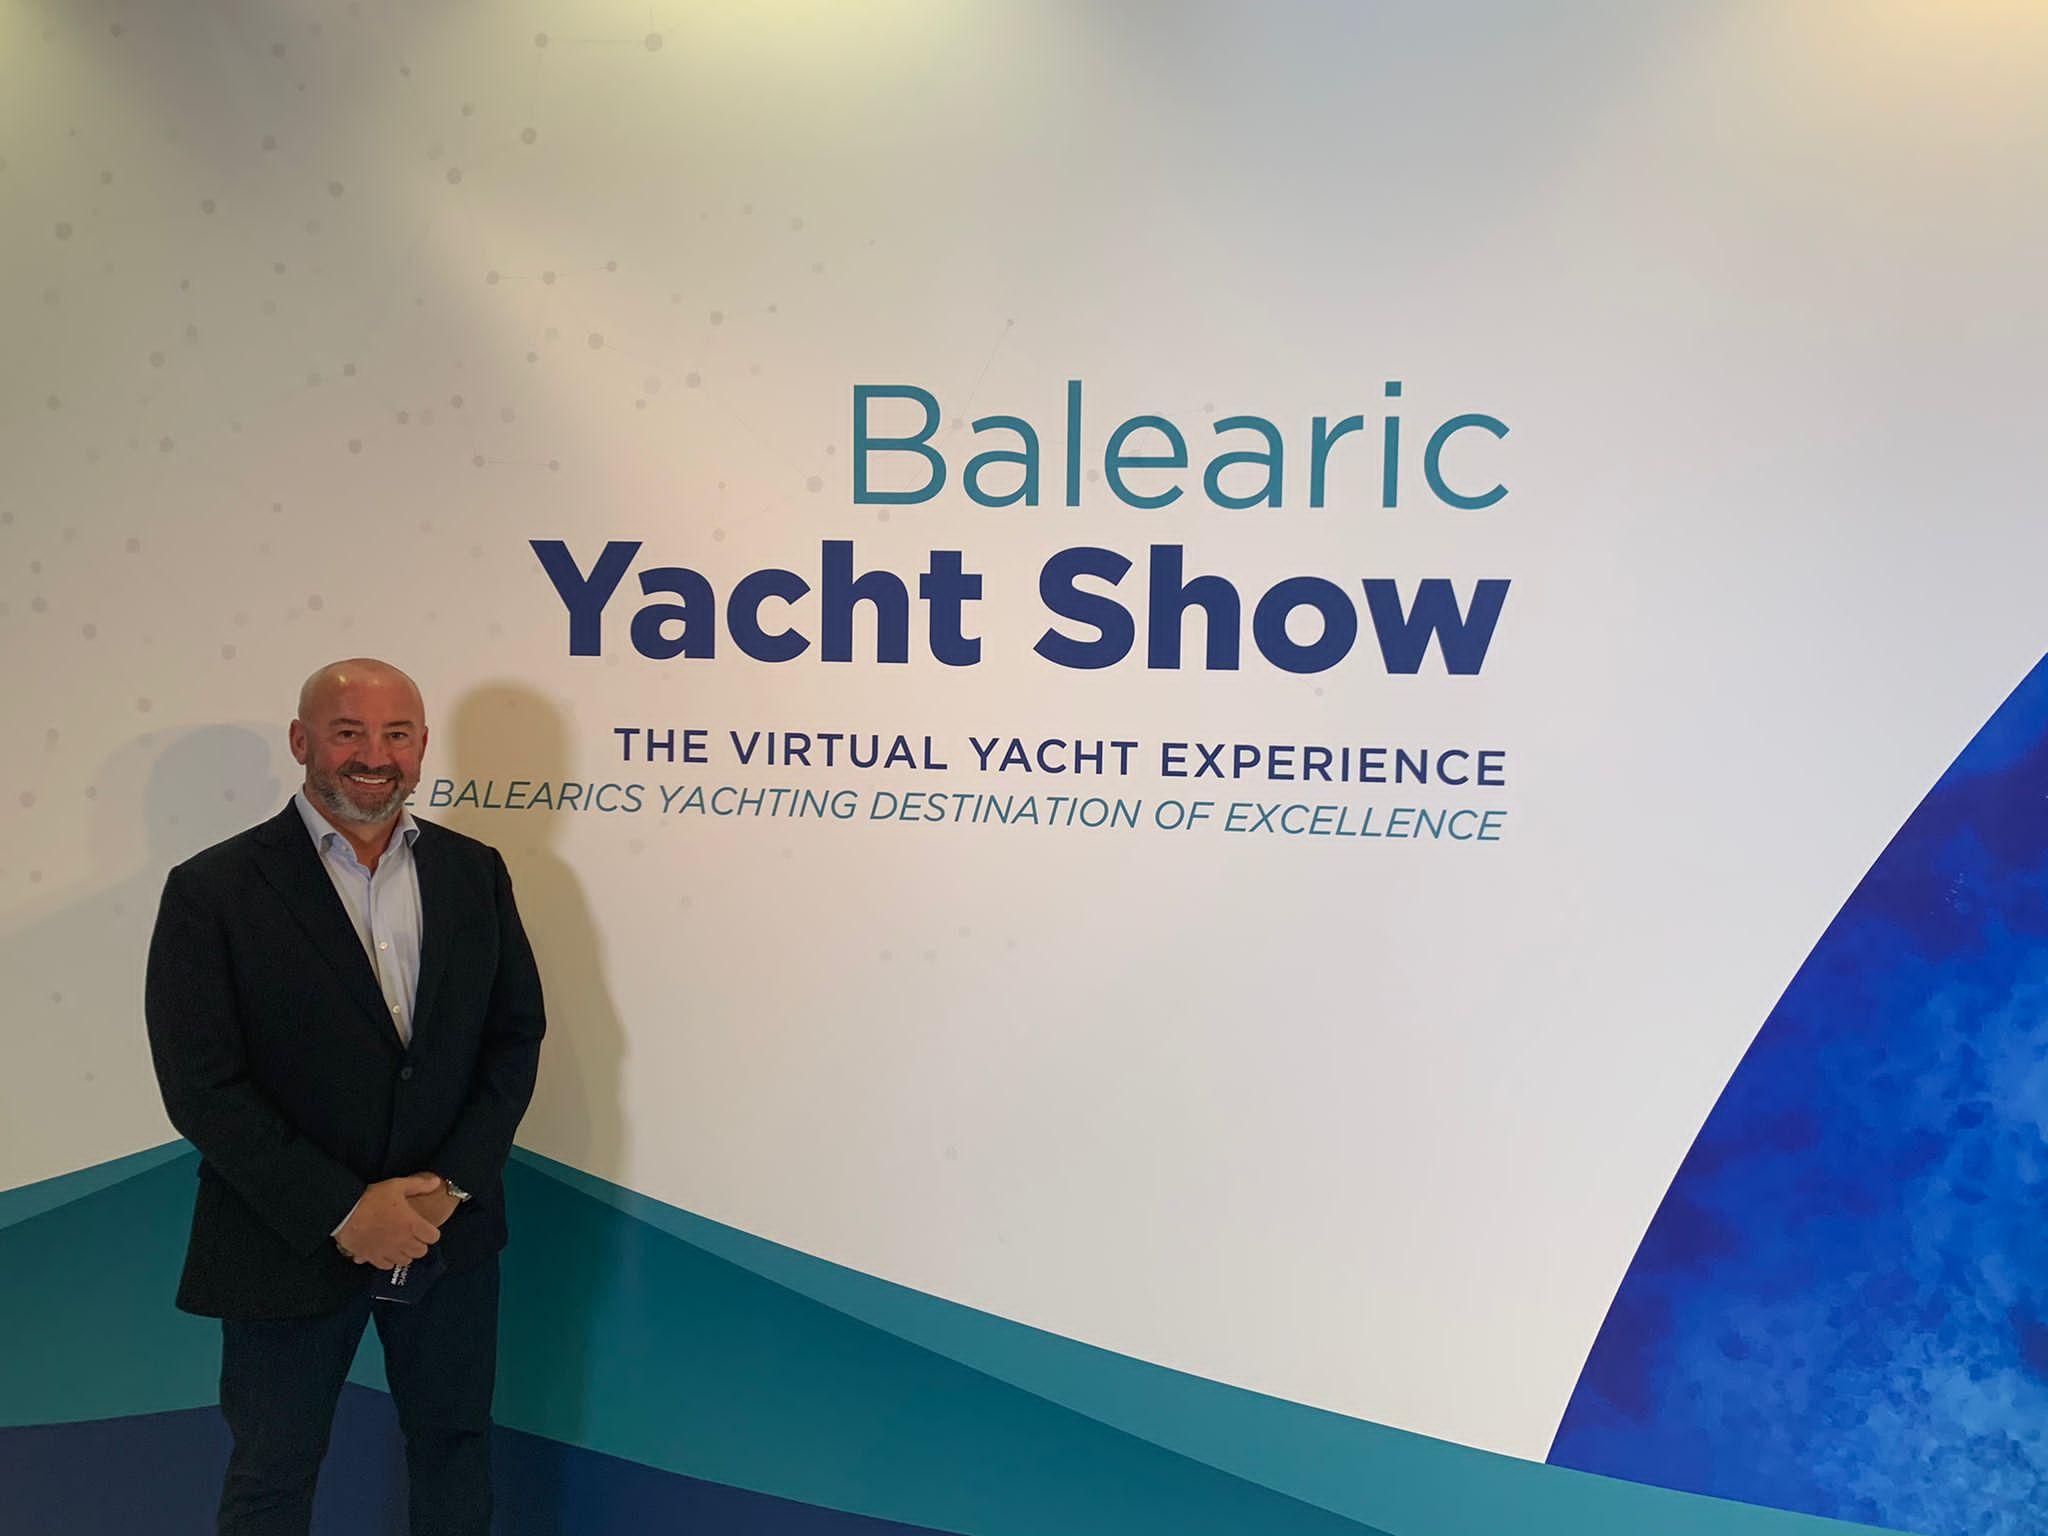 Vuelve Balearic Yacht Show: la feria náutica virtual líder del Mediterráneo